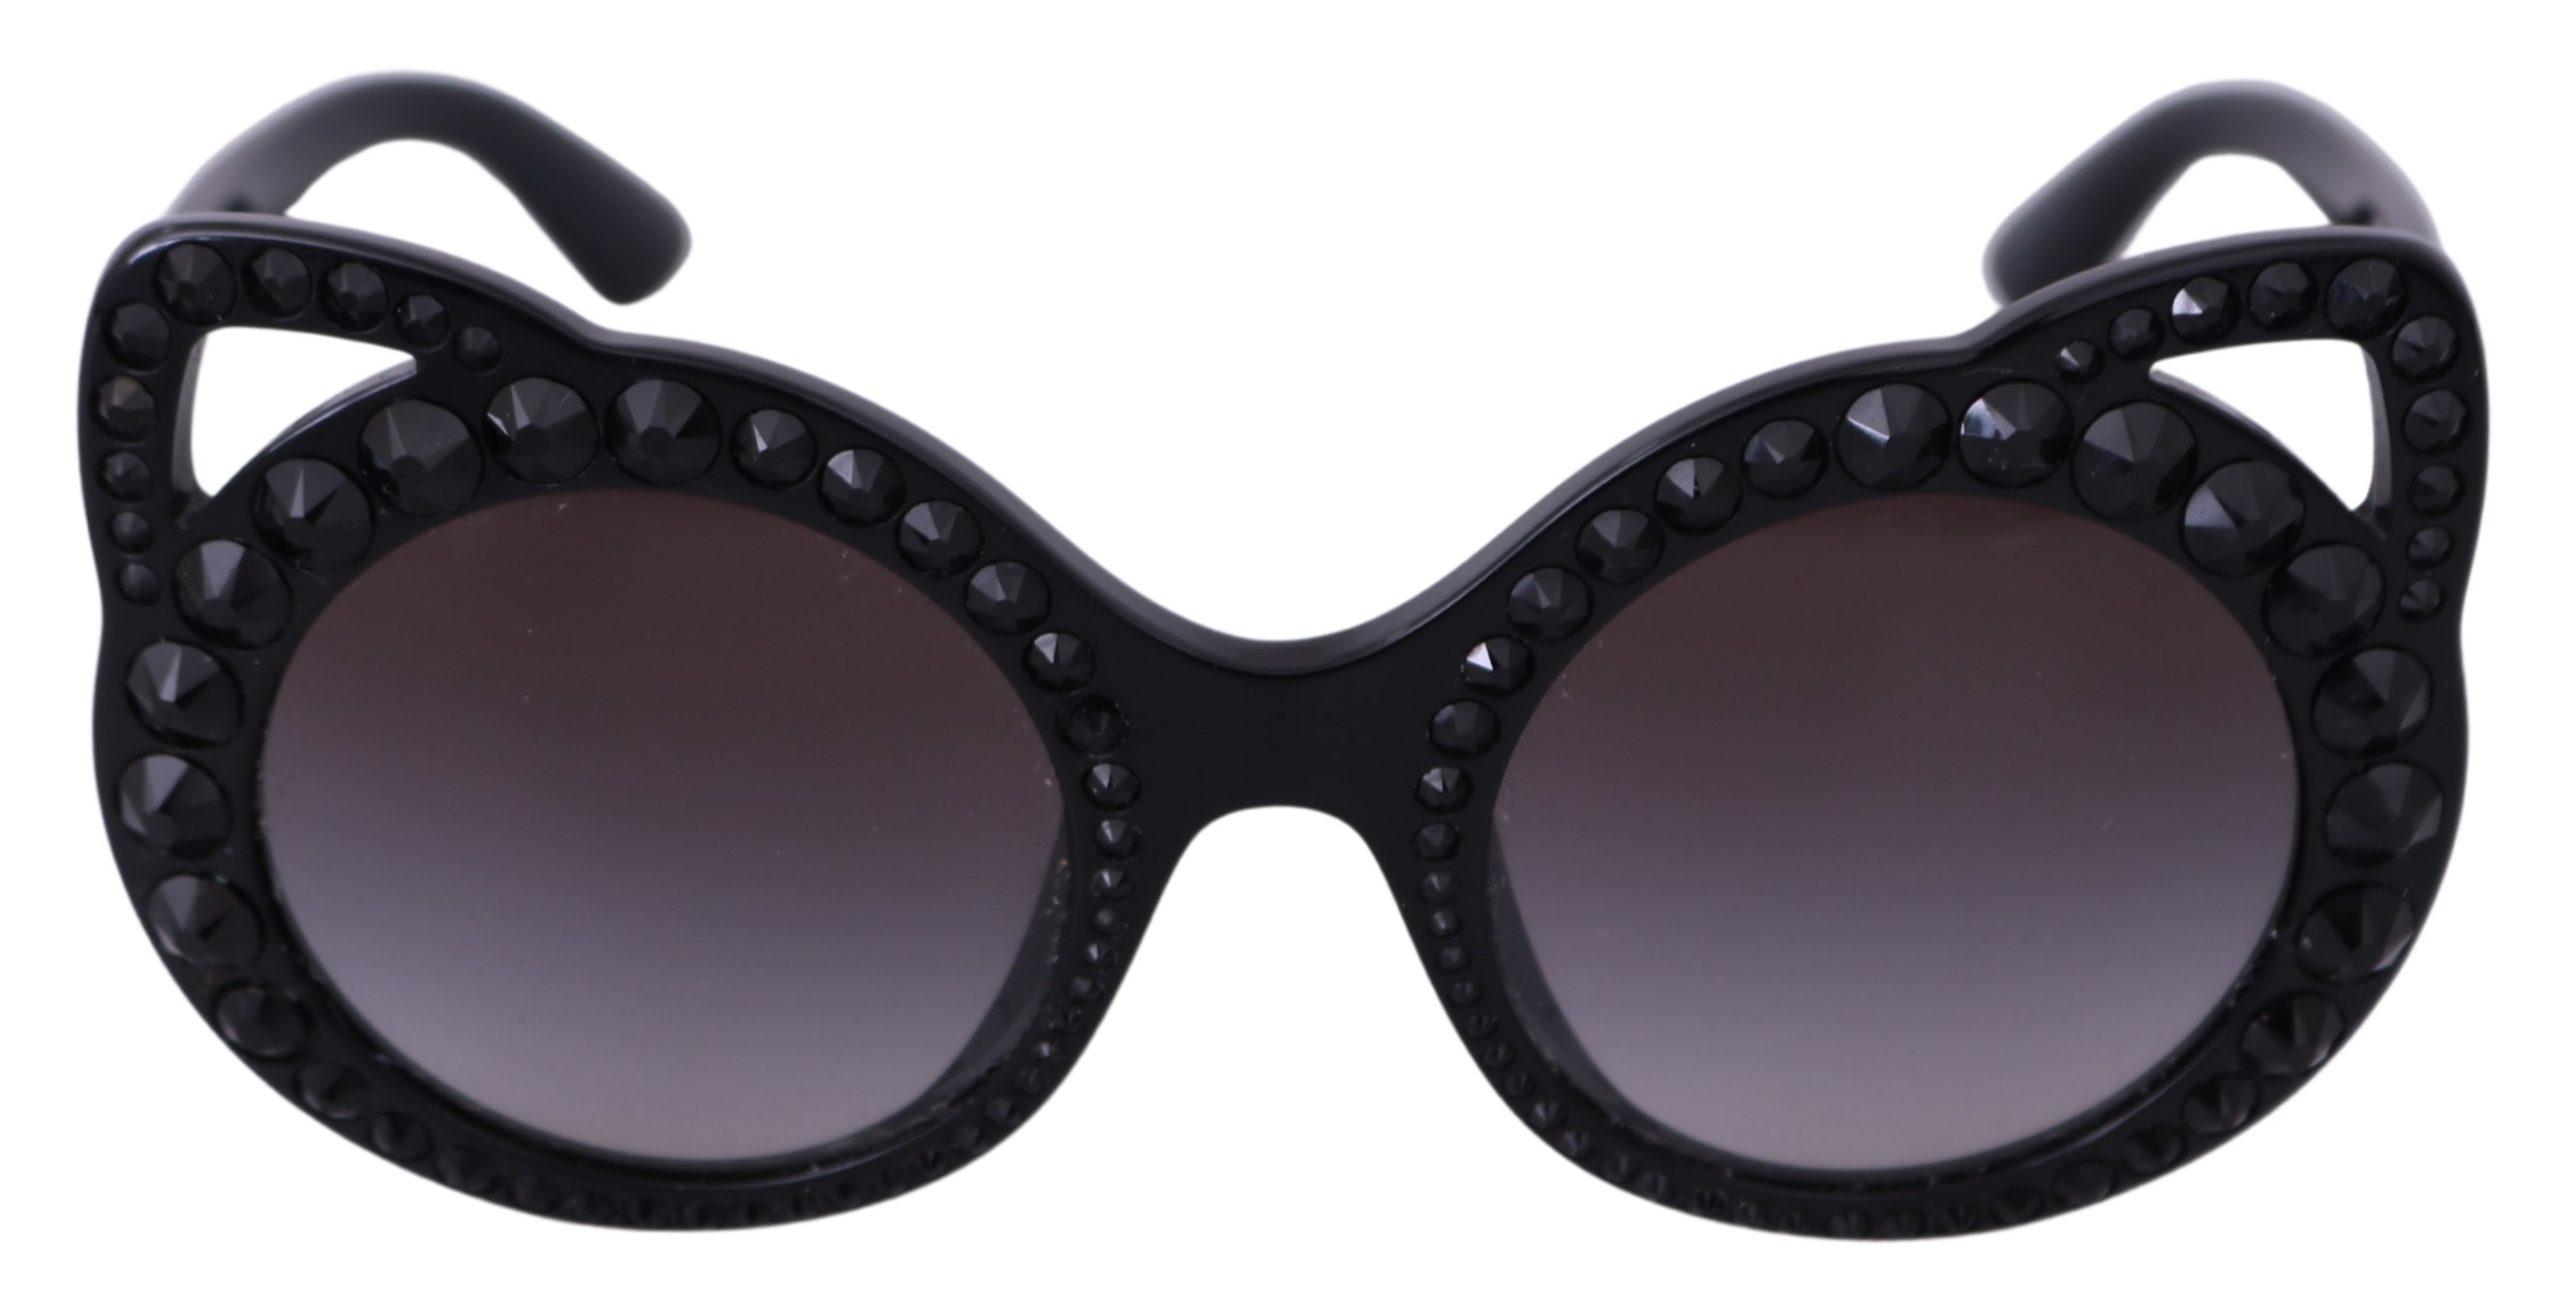 Dolce & Gabbana Women's Studded Cat Ear Logo Sunglasses Black GLA745